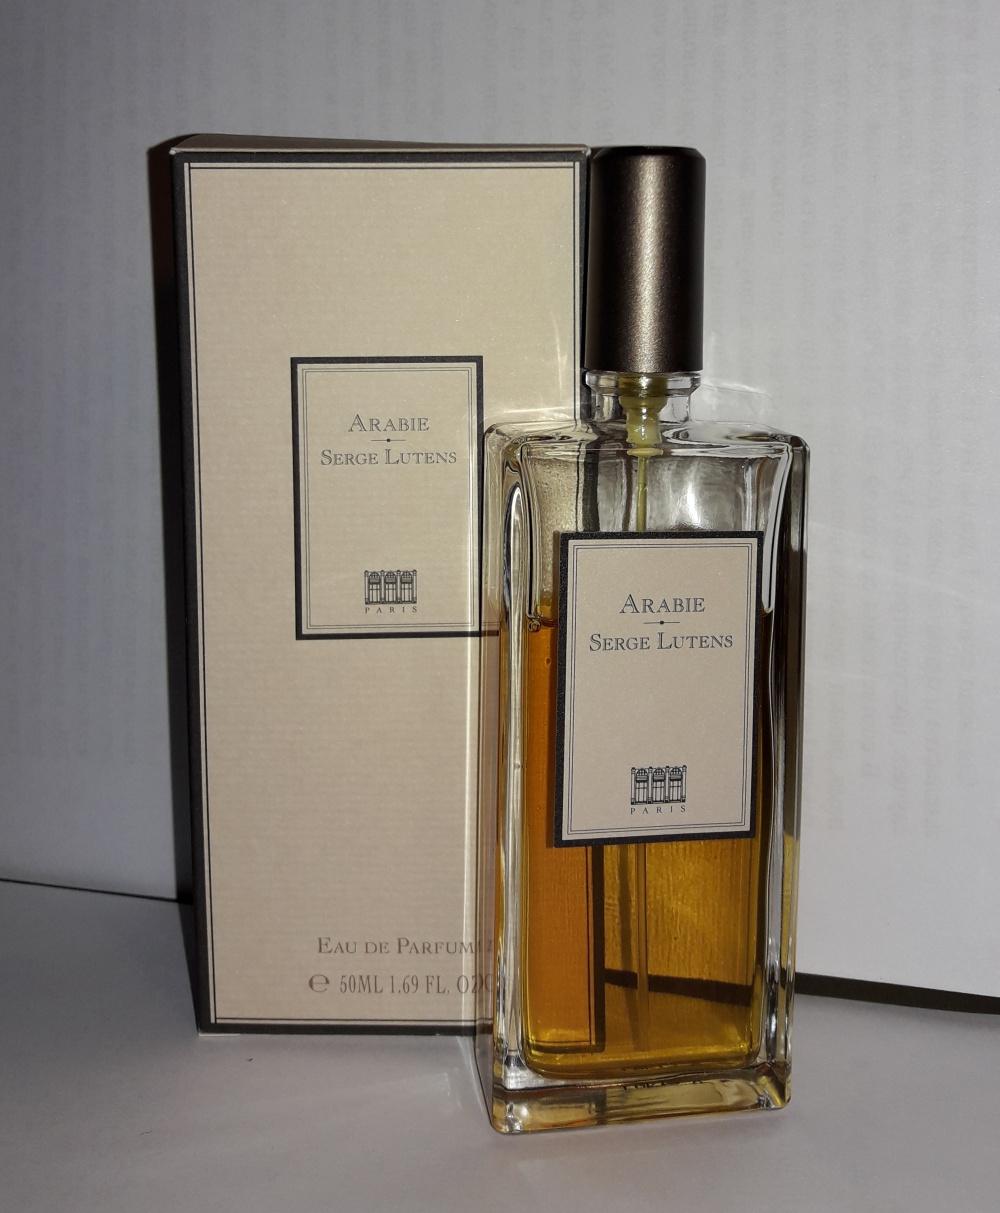 Парфюмированная вода Arabie (Serge Lutens) 37/50 мл